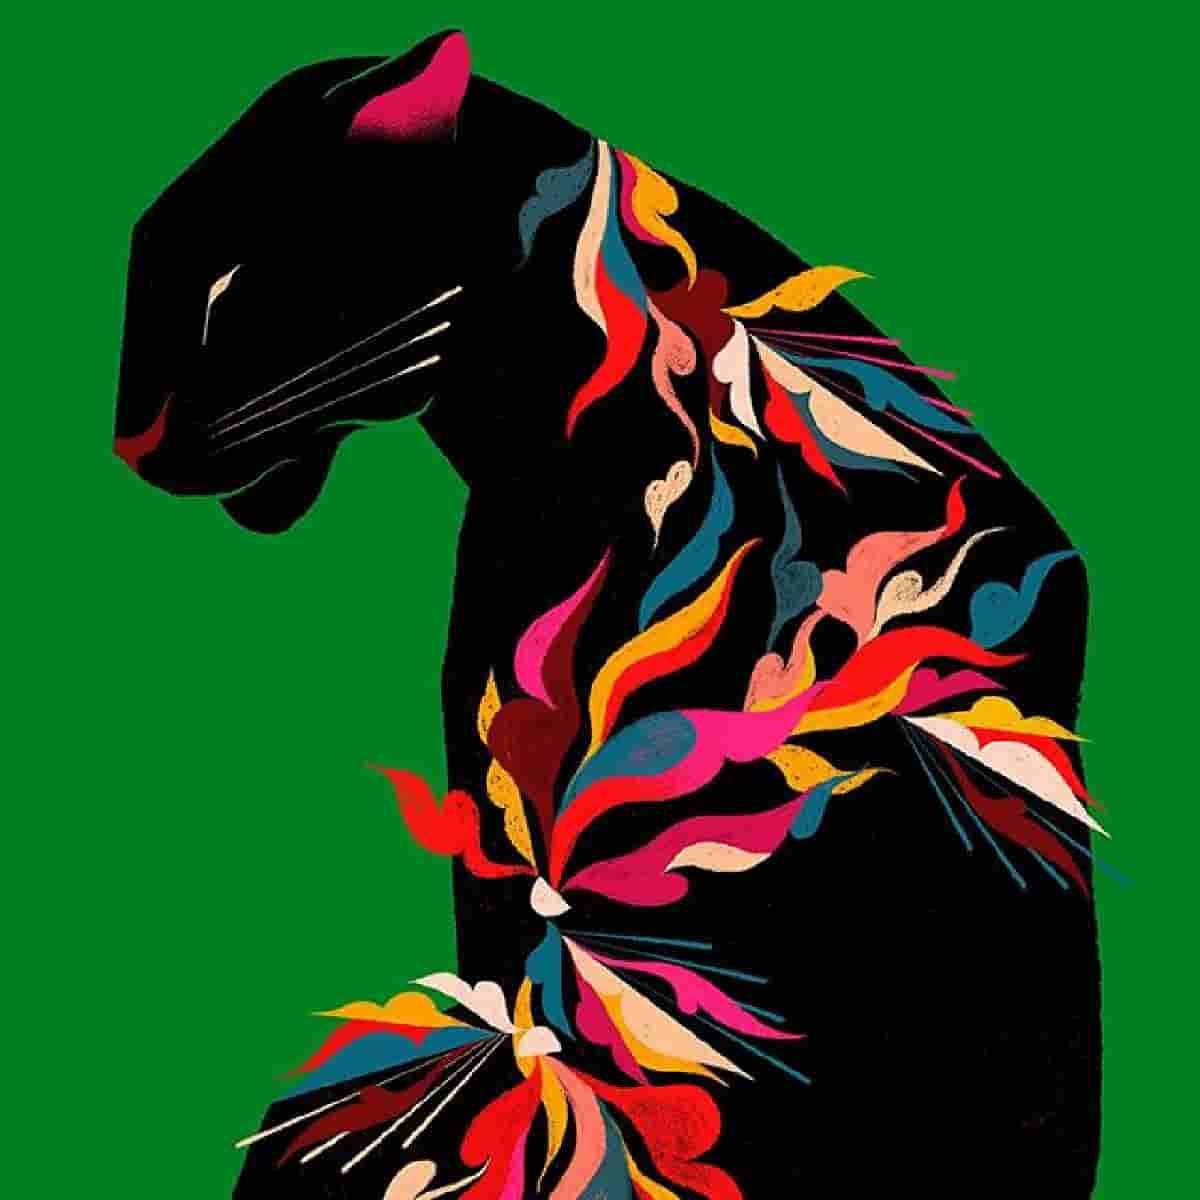 Combining Vibrant Shapes and Simple Lines, Illustrator Willian Santiago Evokes Scenes of Brazil